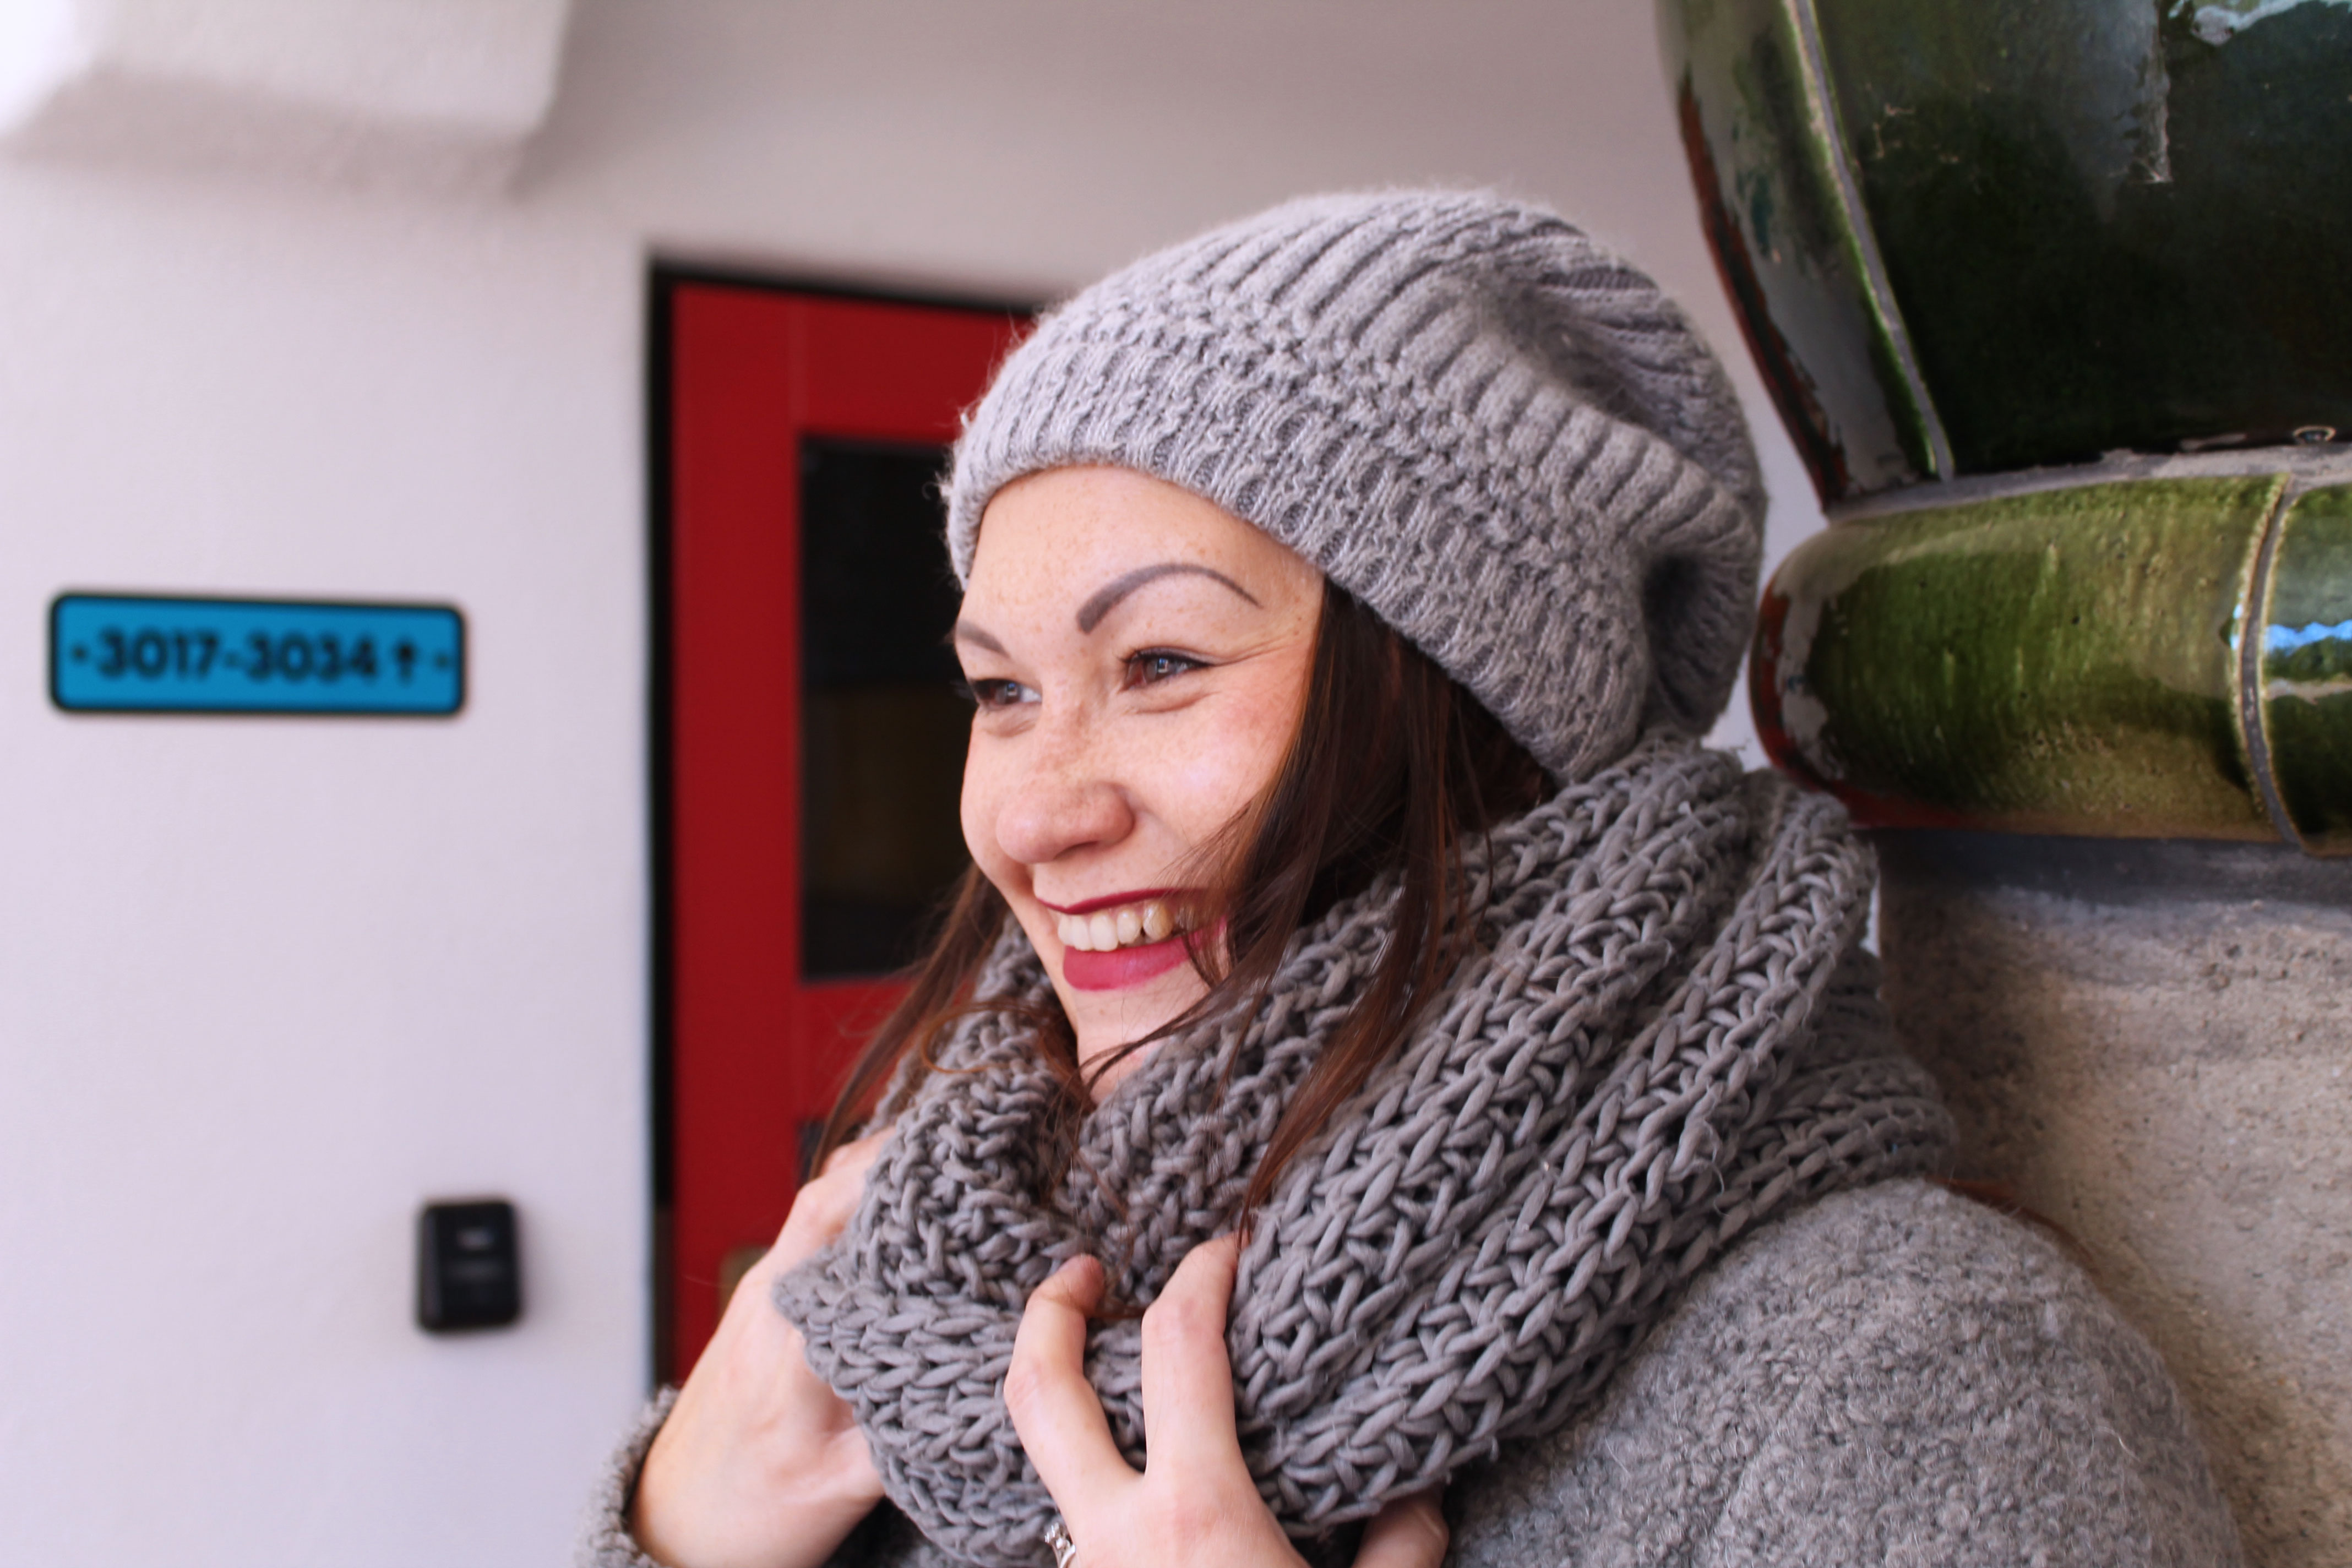 outfit-plussize-boucle-weste-aus-mischgarn-wolle-musthave-winterlook-kardiaserena-merino-beanie